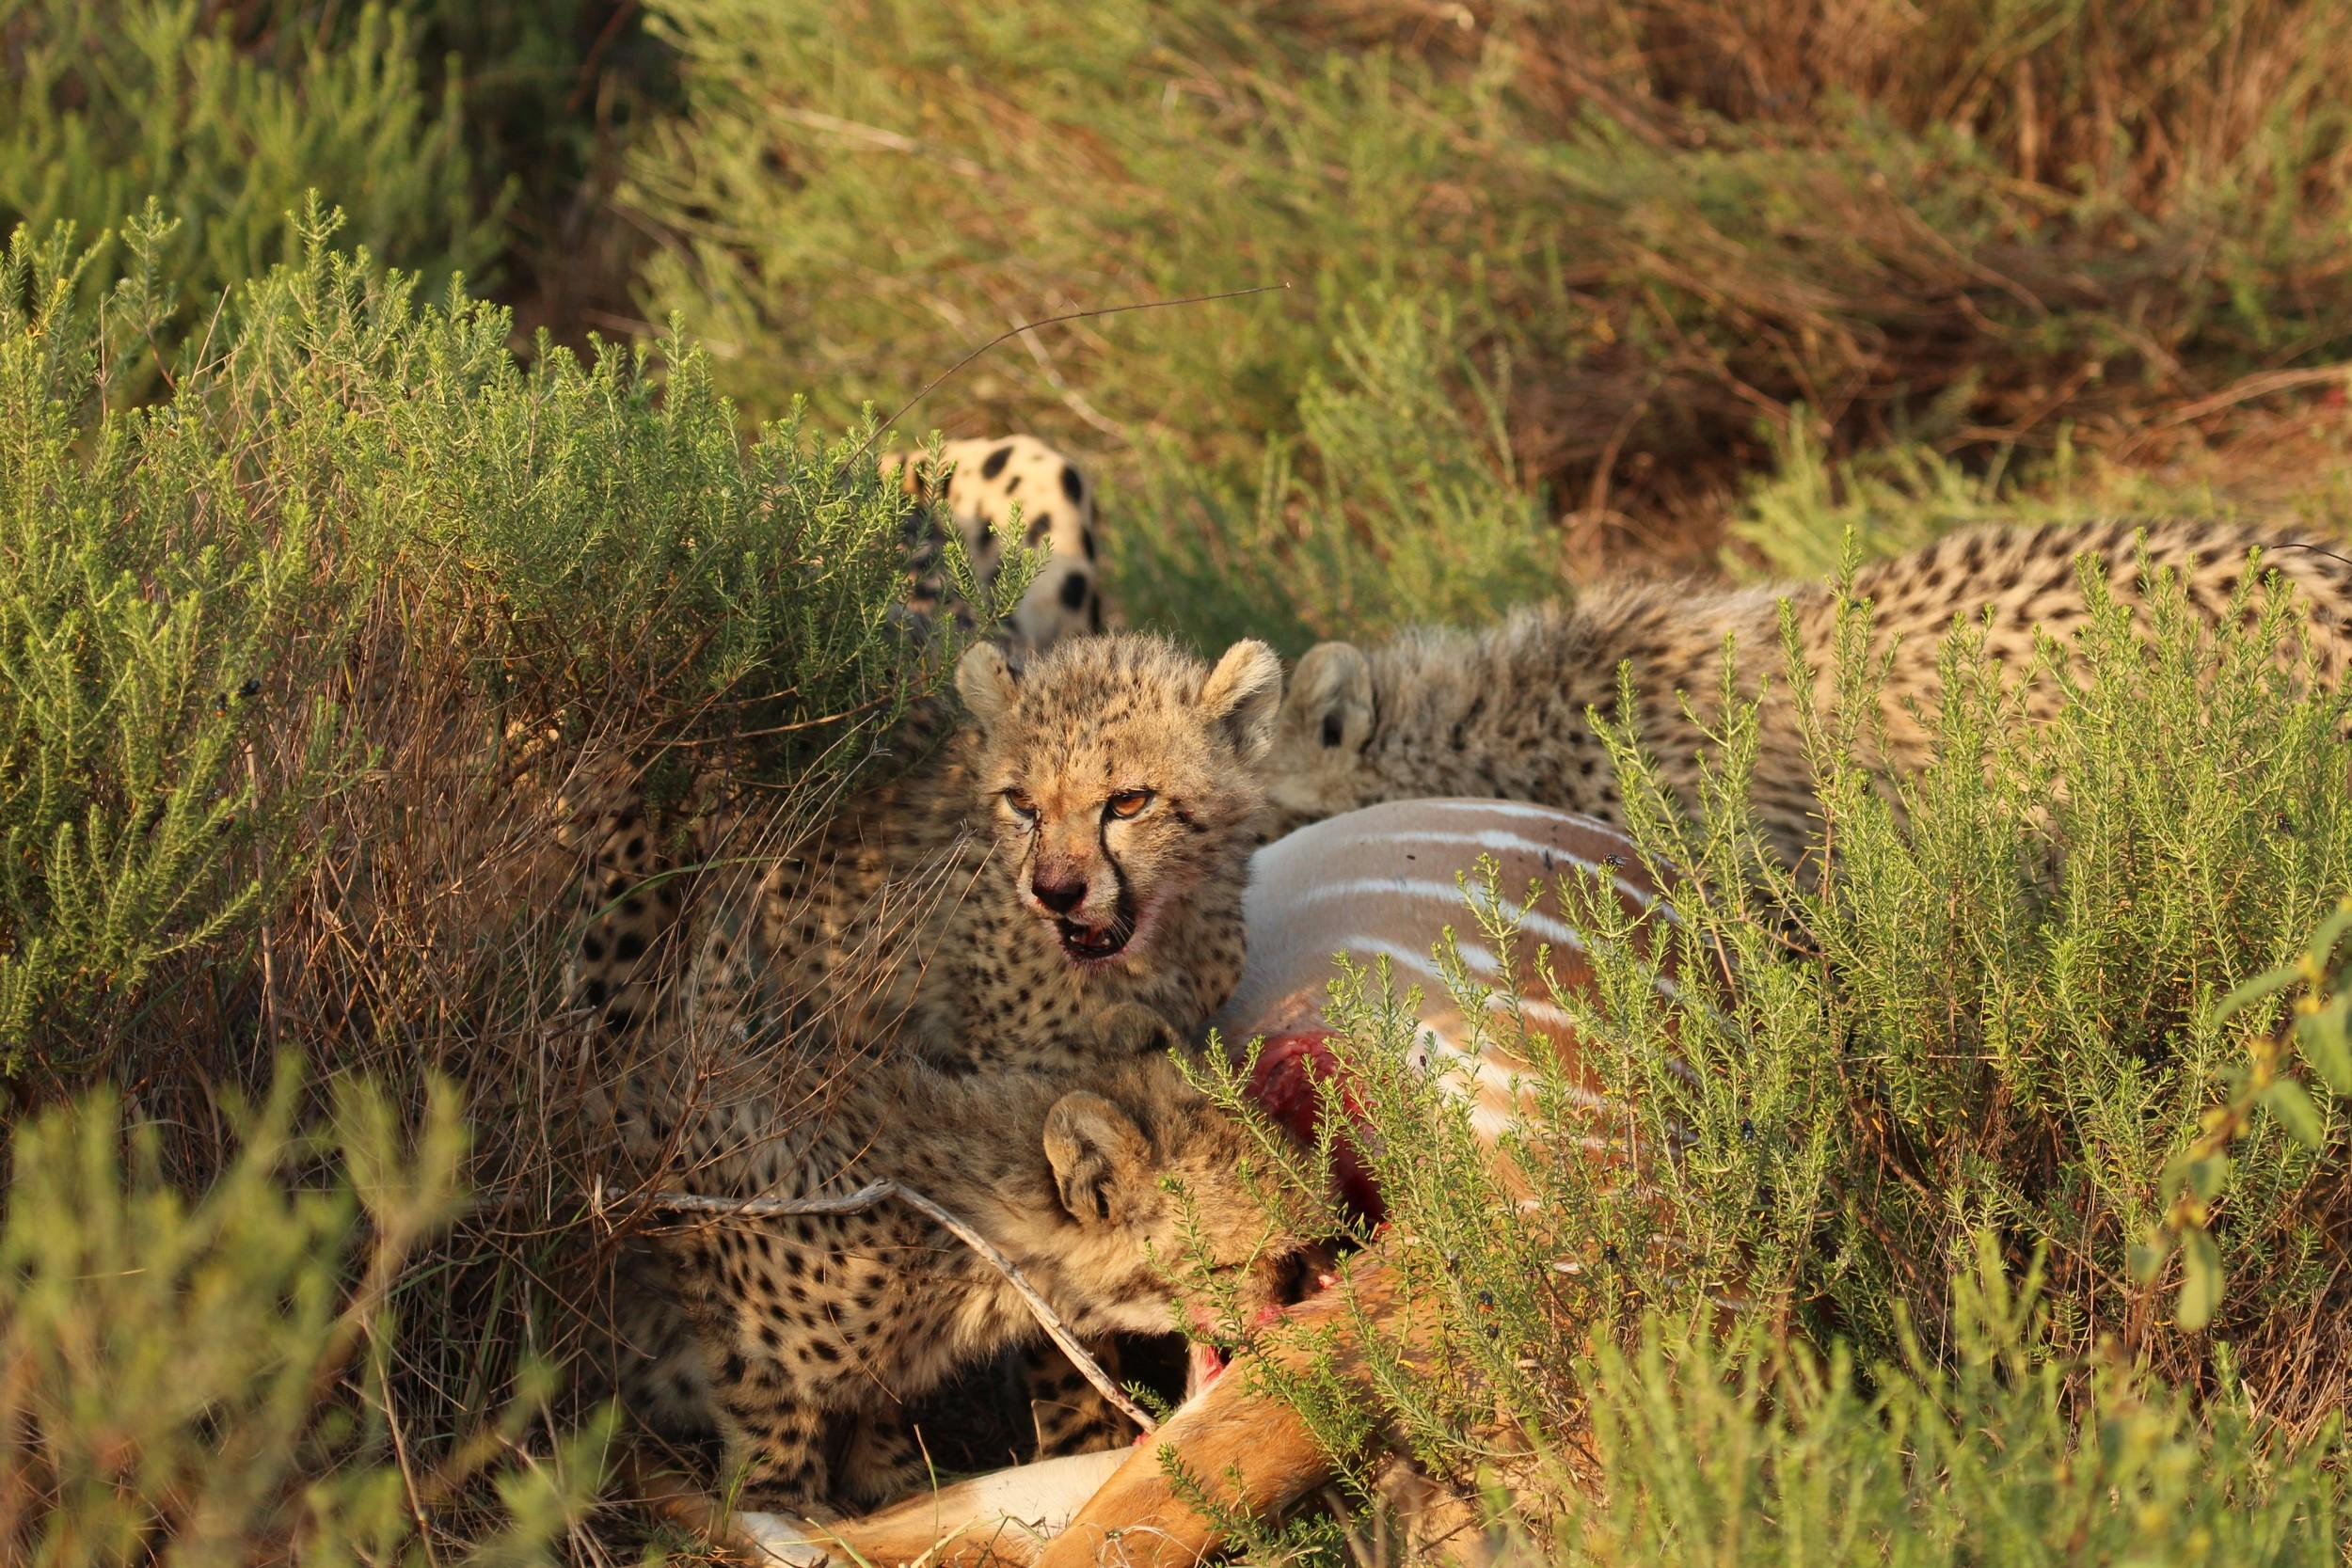 fierce baby cheetah